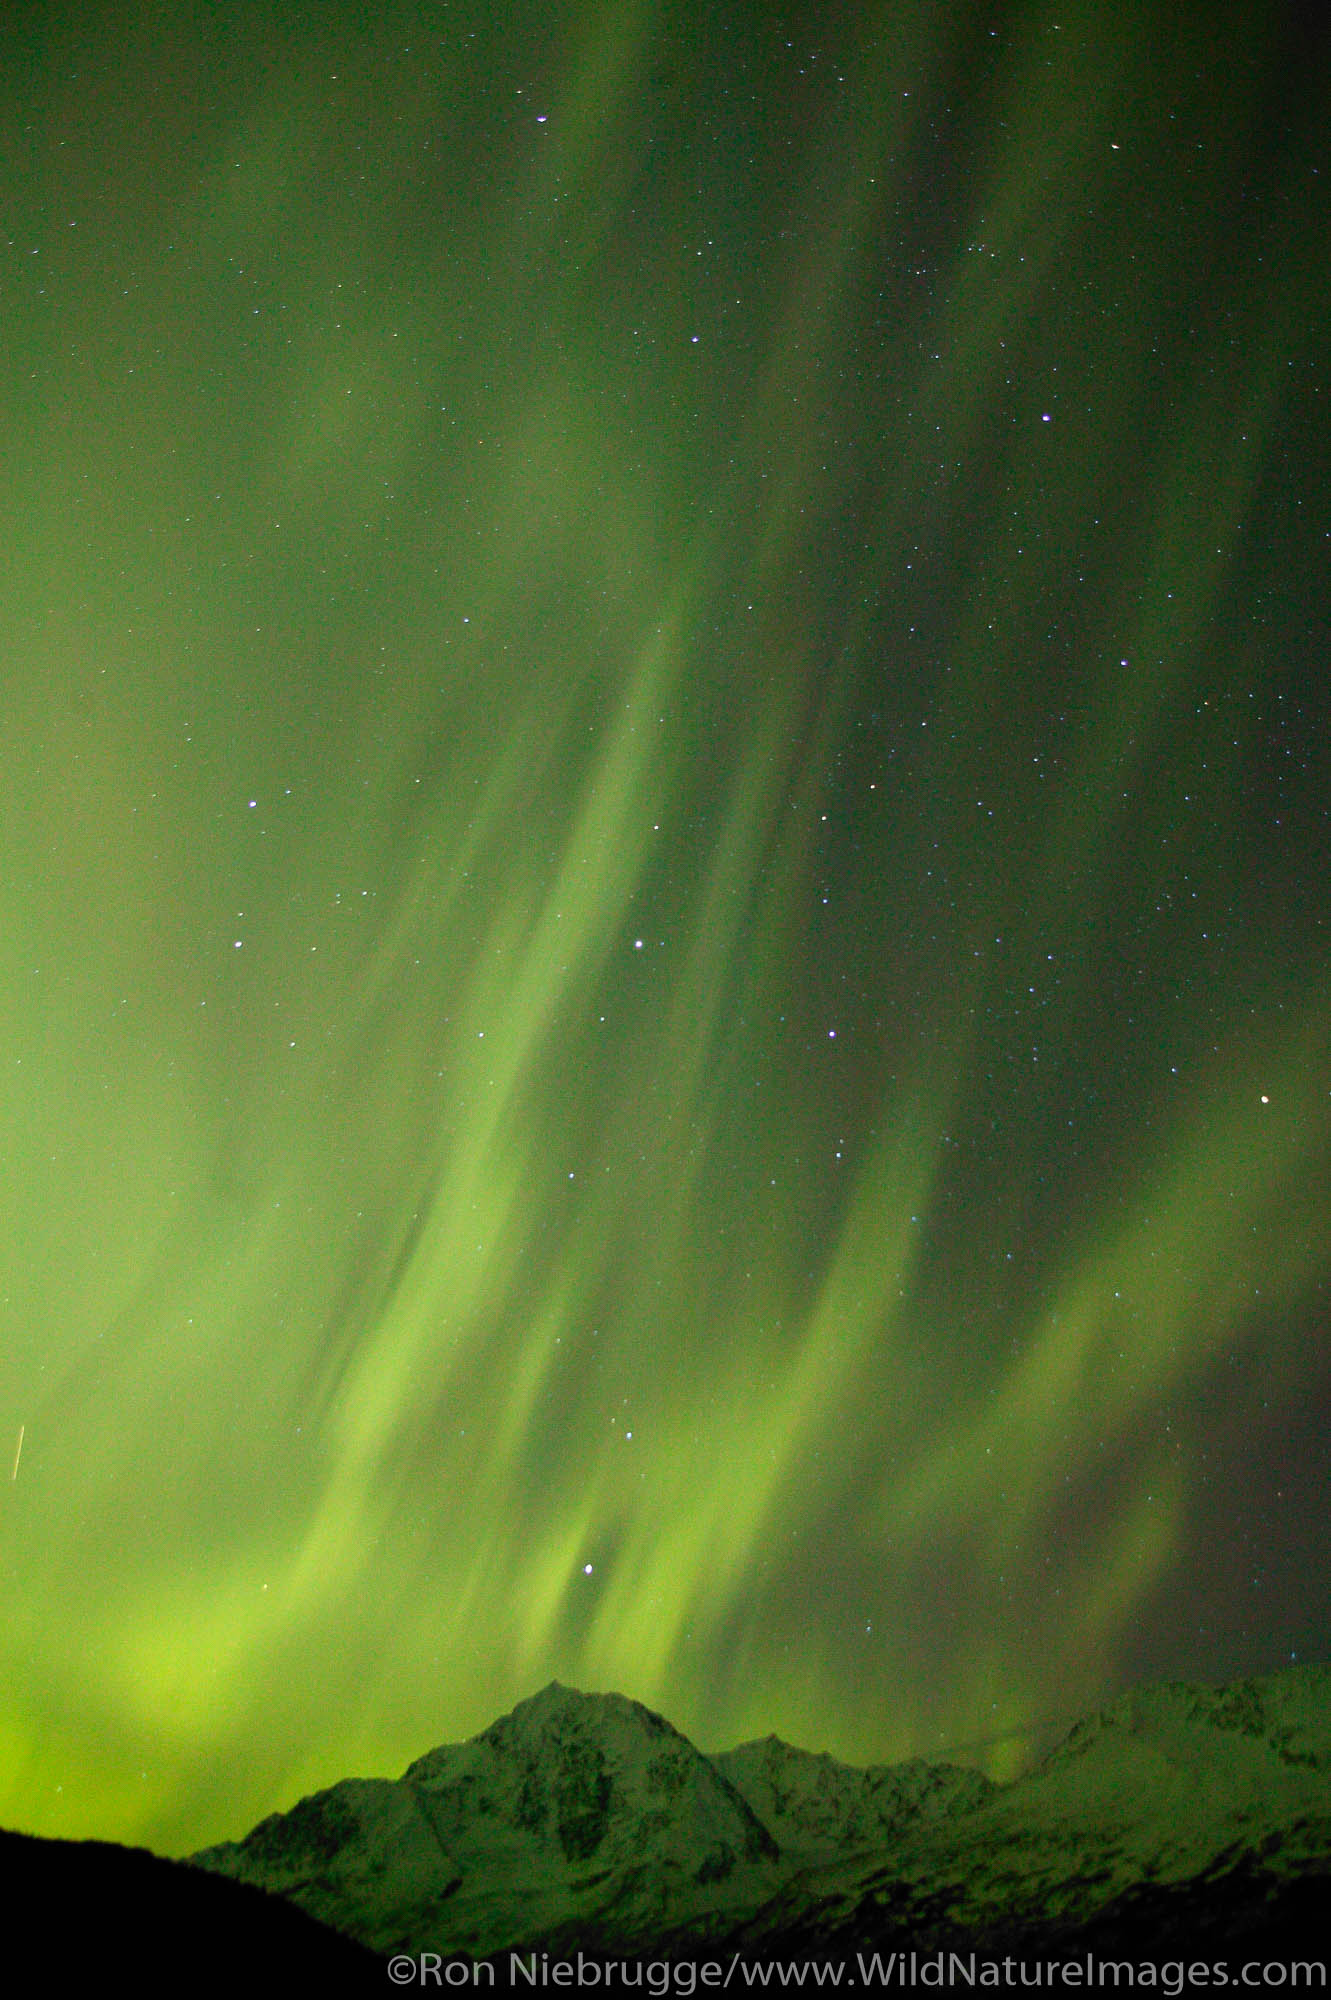 Colorful Northern Lights (Aurora Borealis) over the mountains of the Chugach National Forest on the Kenai Peninsula near Seward...